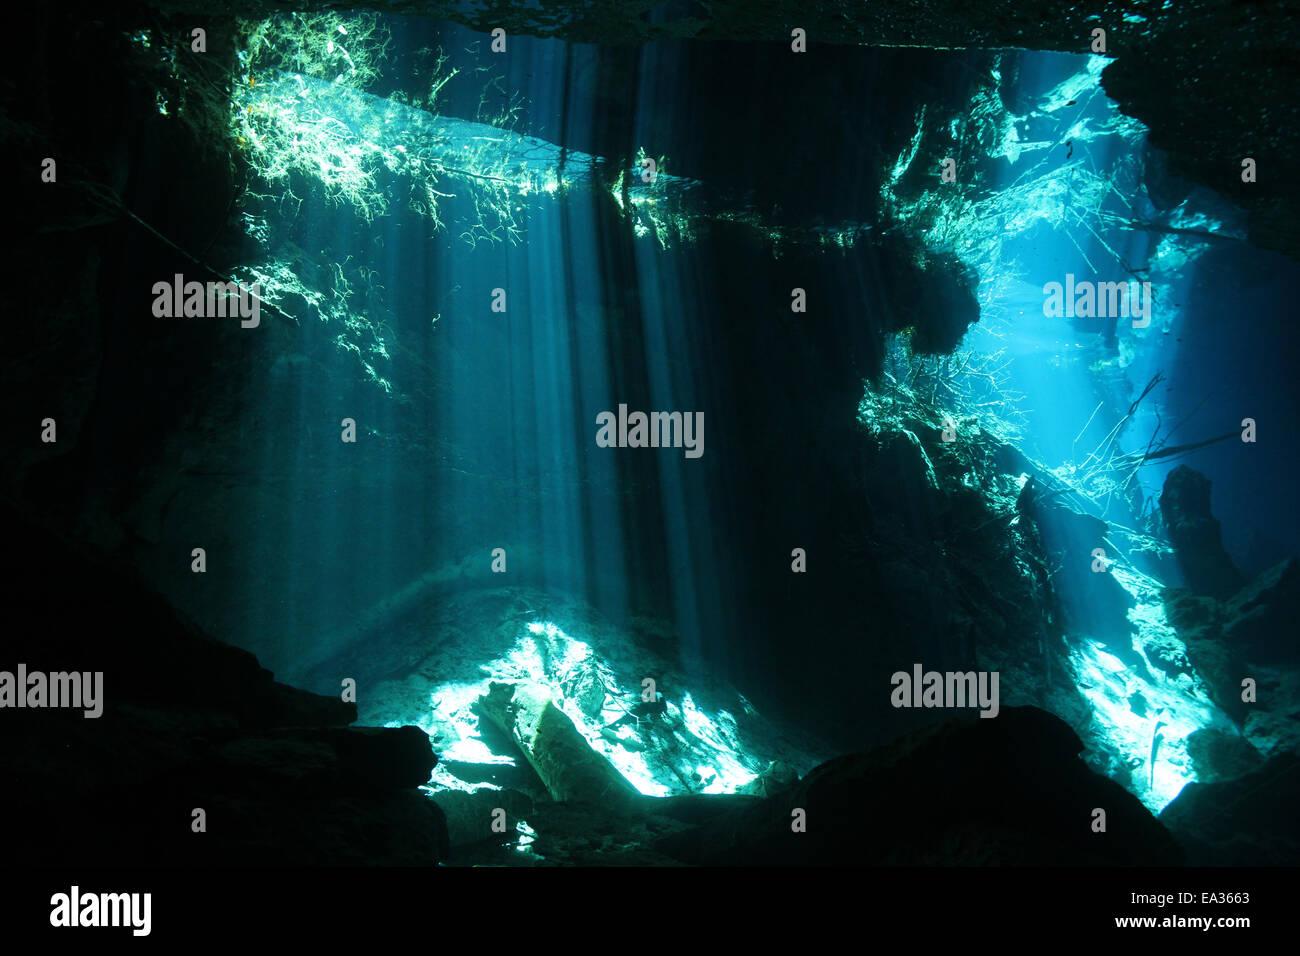 Chac Mool Cenote - Stock Image